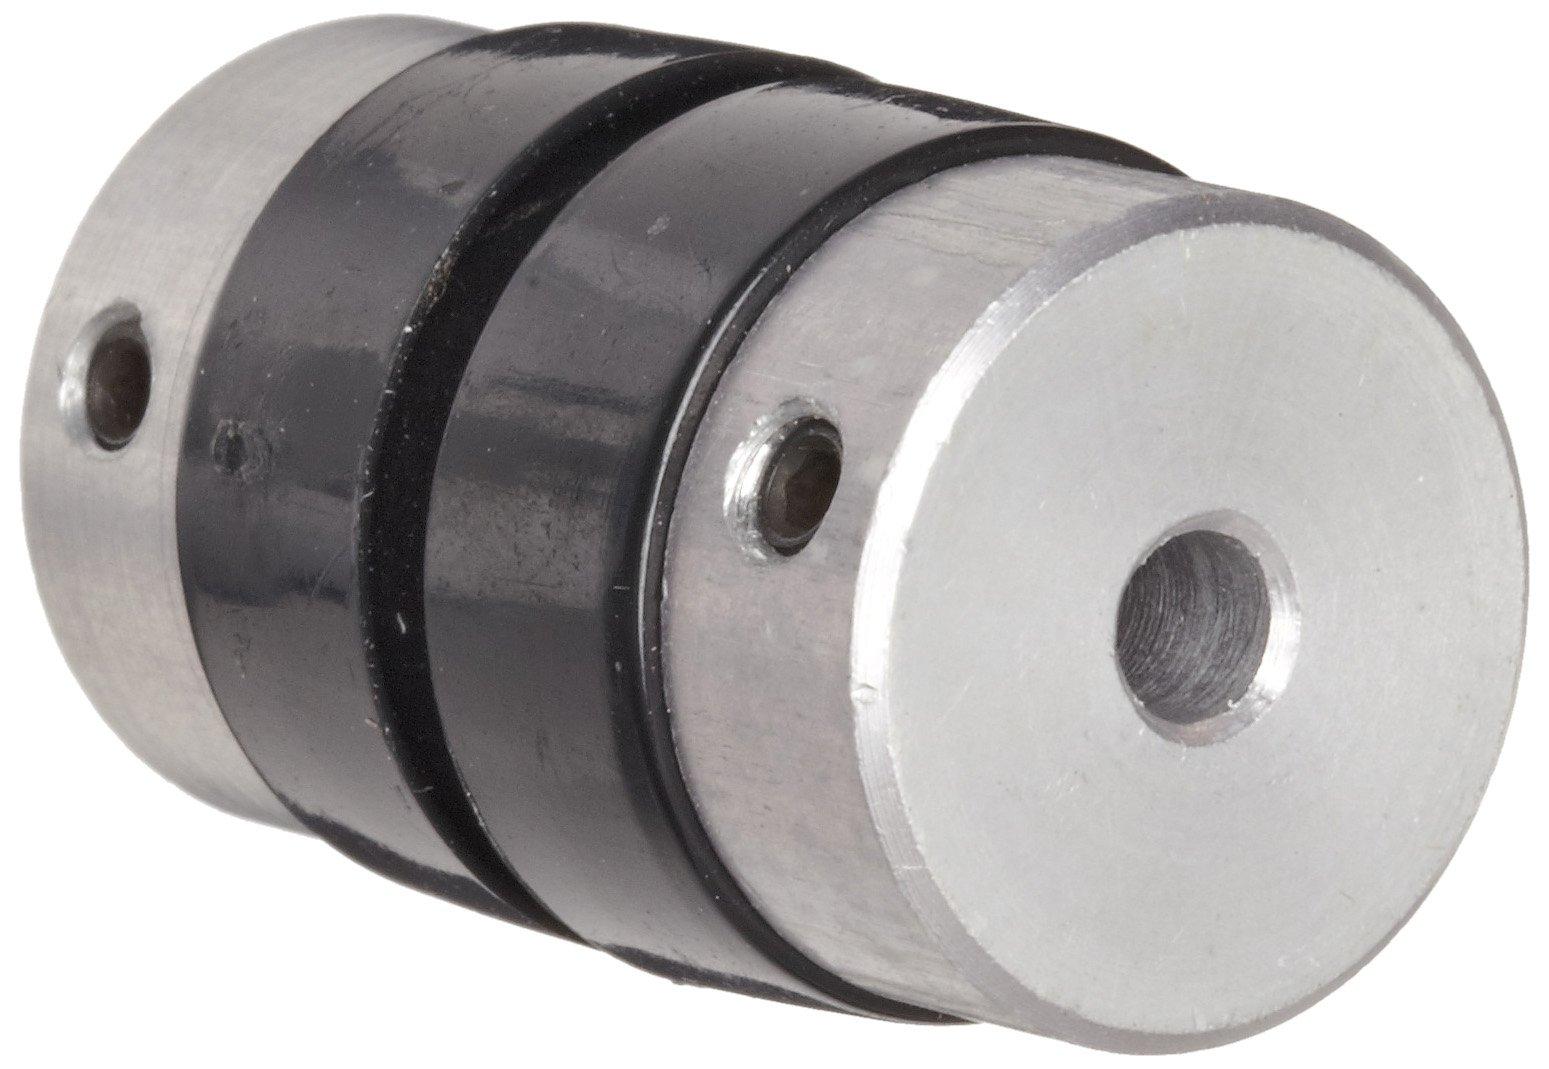 "Boston Gear FCP211/8 Shaft Coupling, Sleeve Type, 0.125"" Bore, 0.578"" Outside Diameter, 0.938"" Overall Length"